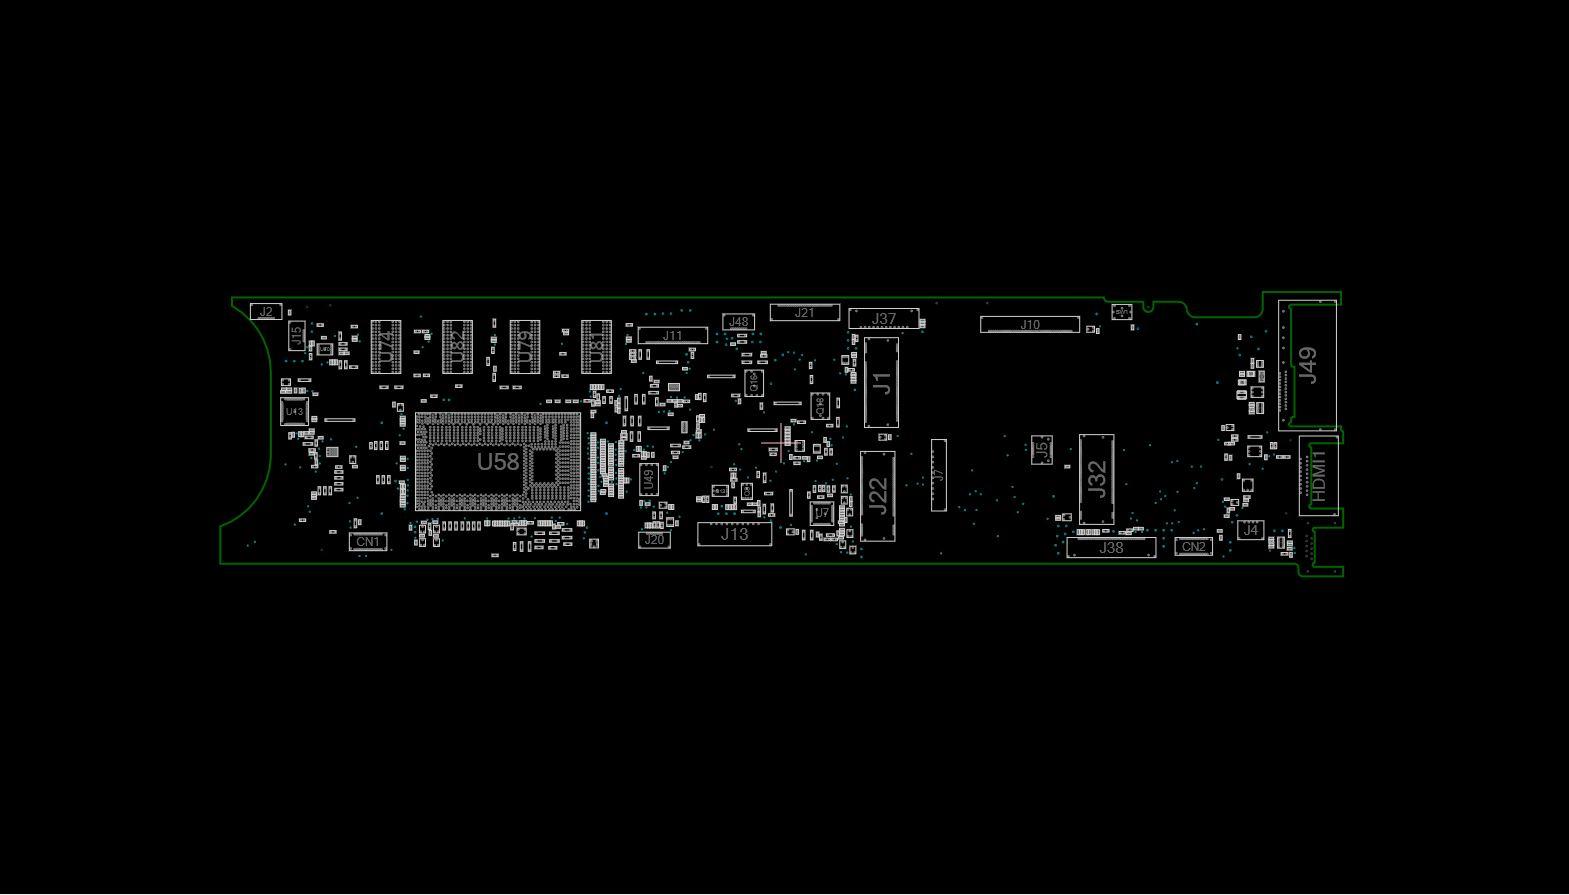 Lenovo Thinkpad X1 Carbon 3rd Gen Schematic  U0026 Boardview